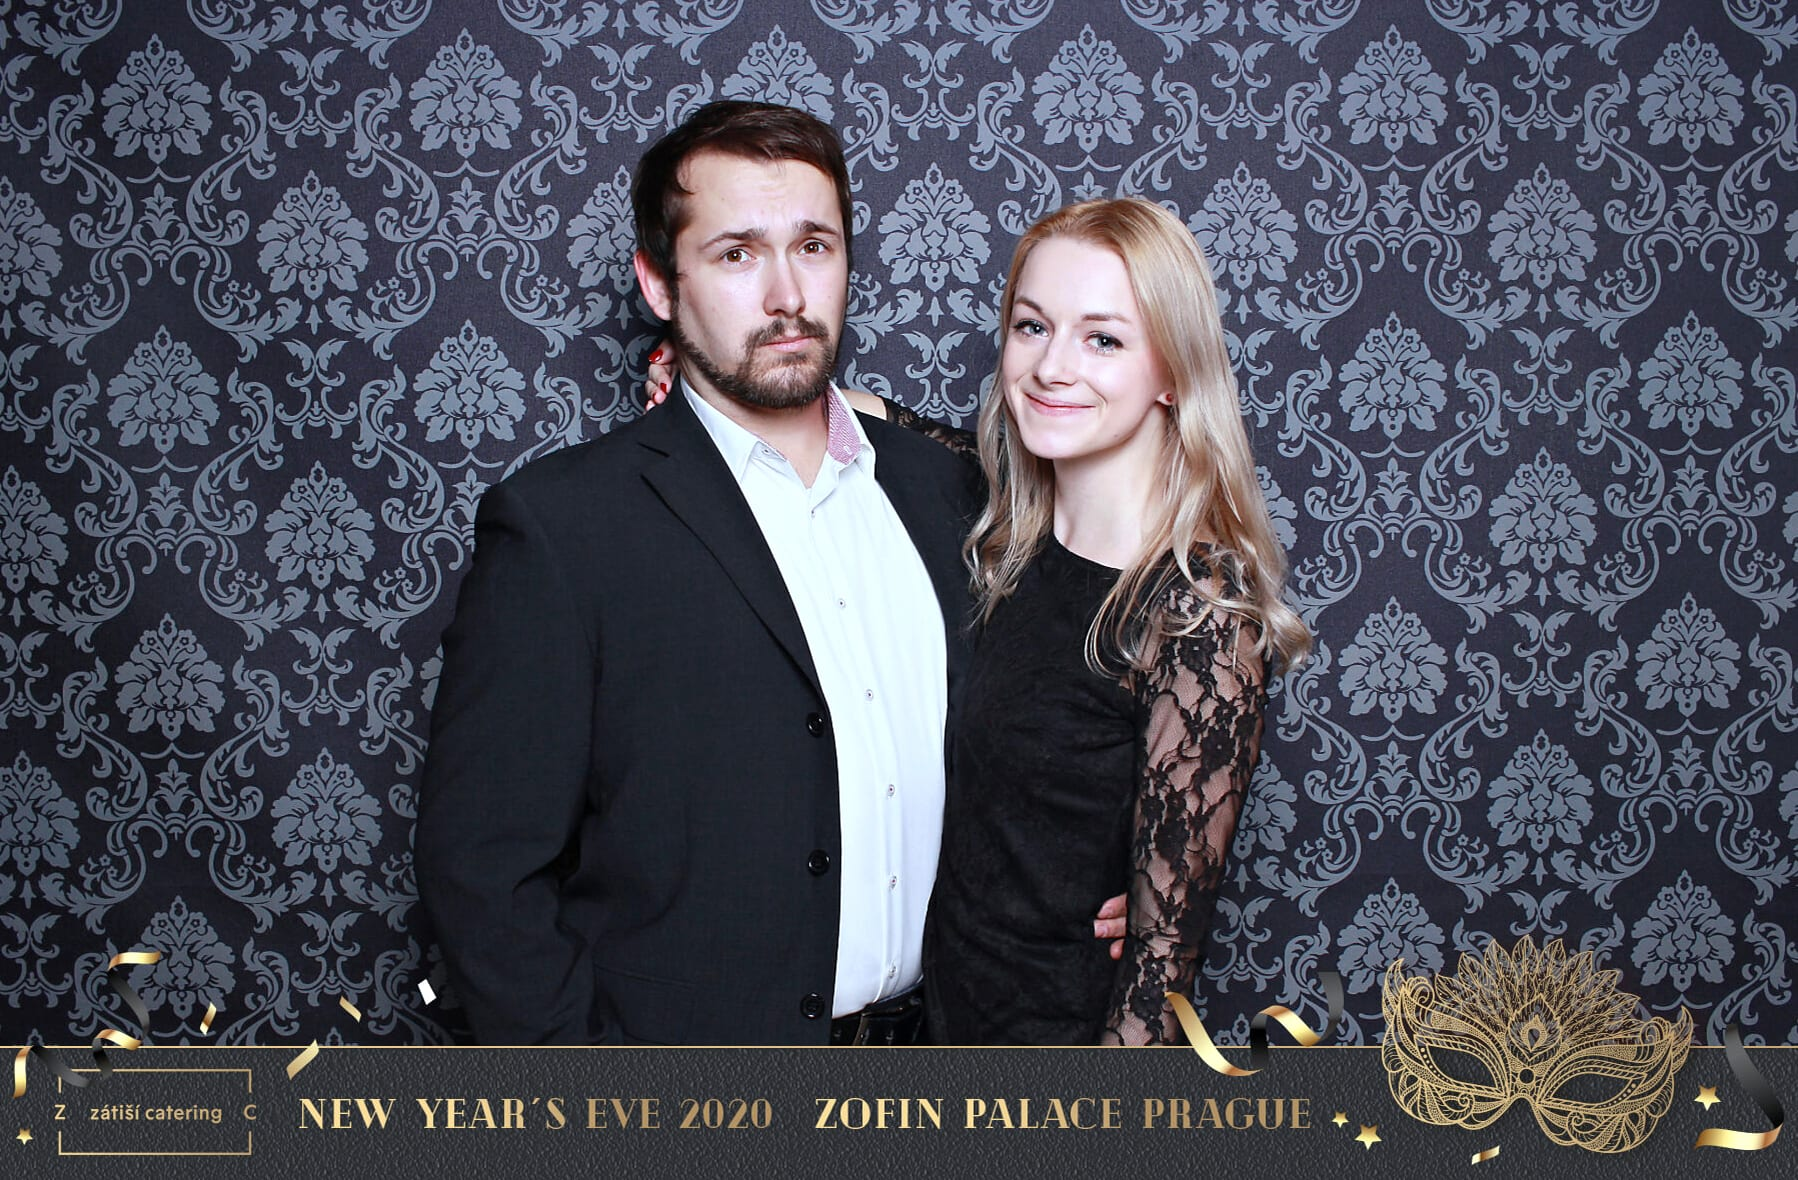 fotokoutek-galavecer-oslava-praha-zofin-31-12-2019-707335